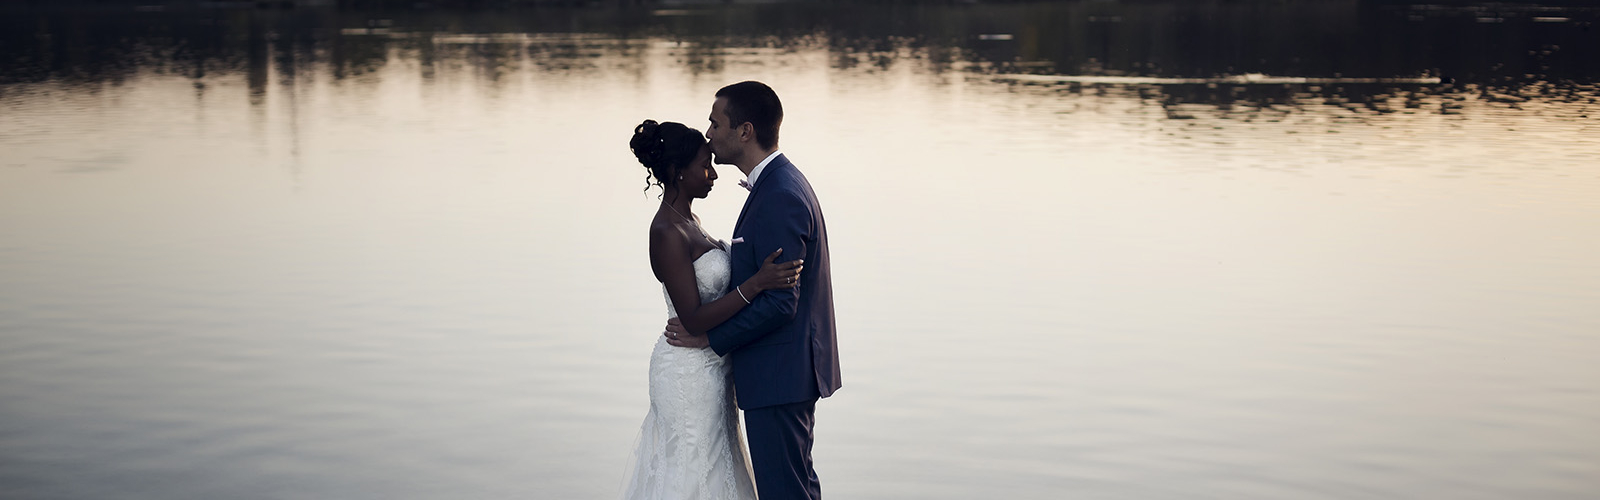 prix-photographe-mariage